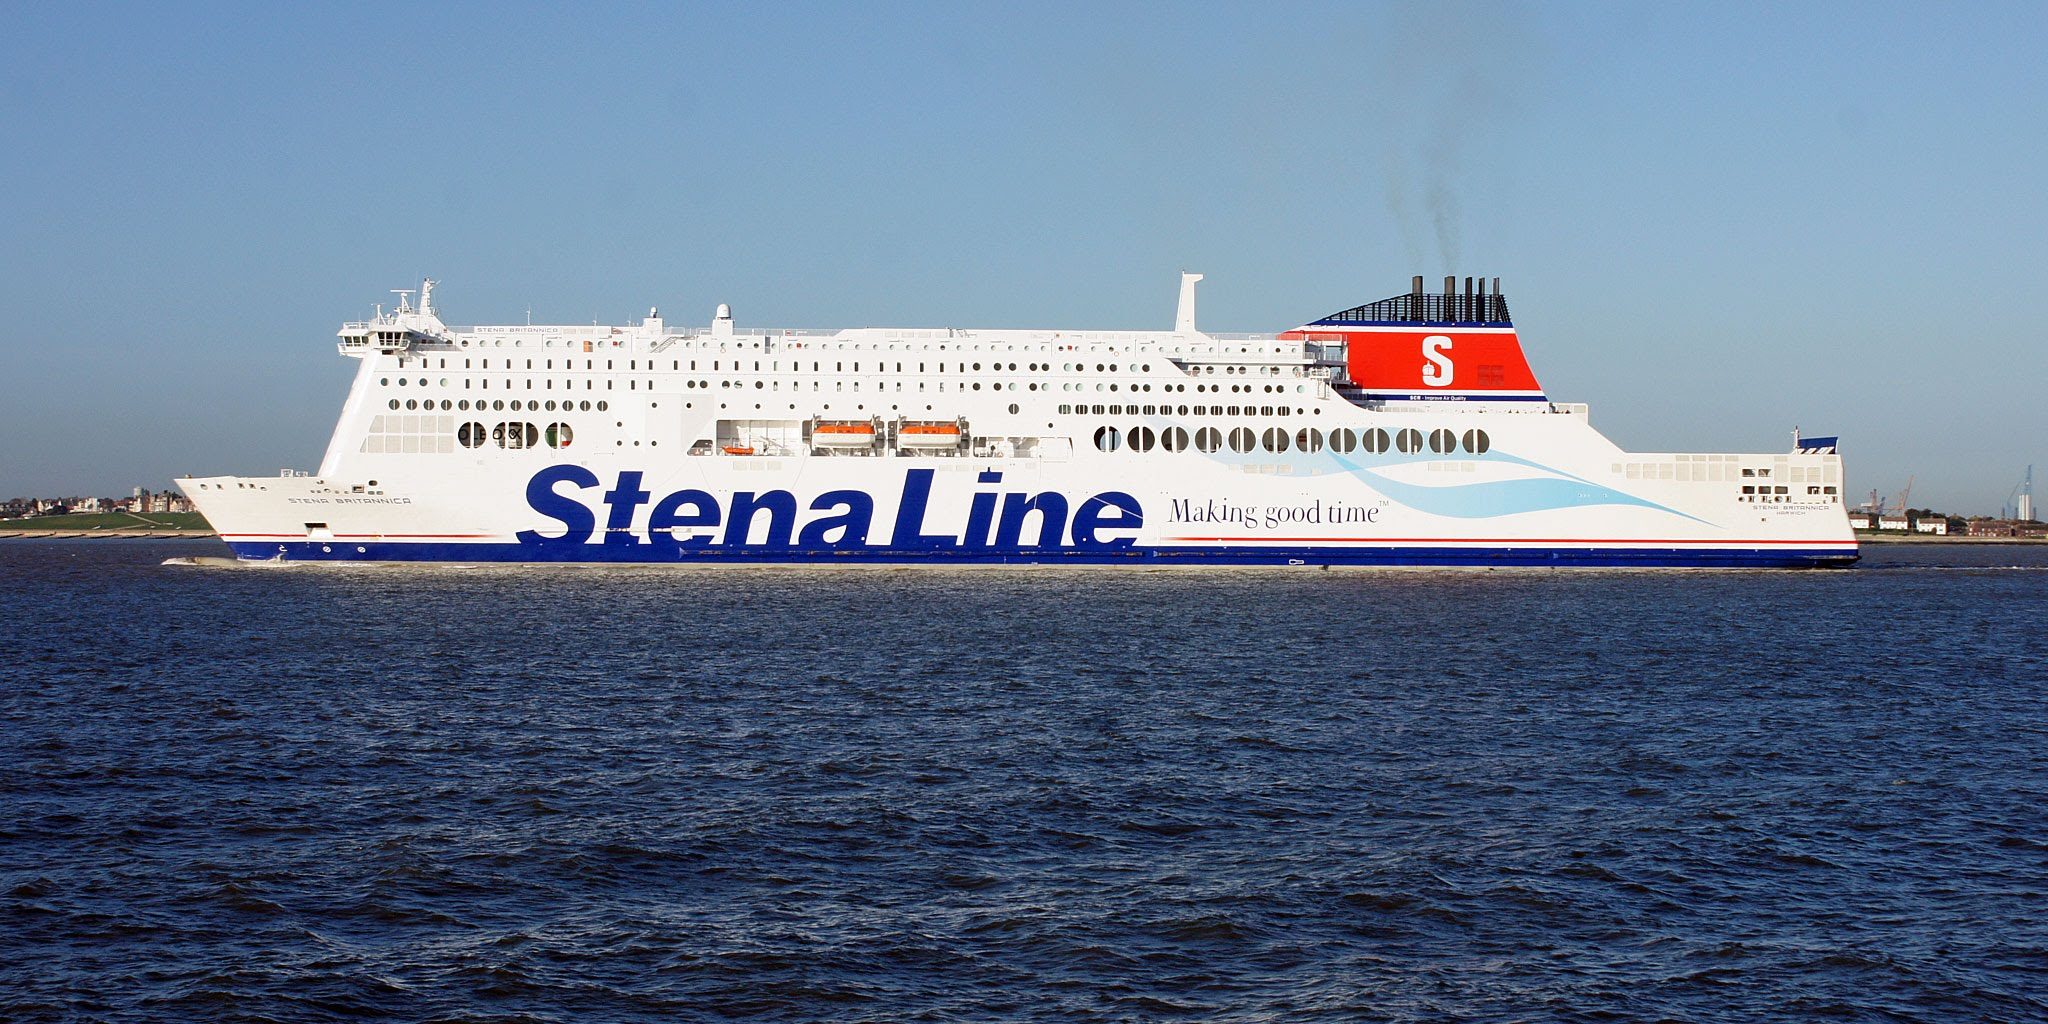 Book color line ferry - Slider 1